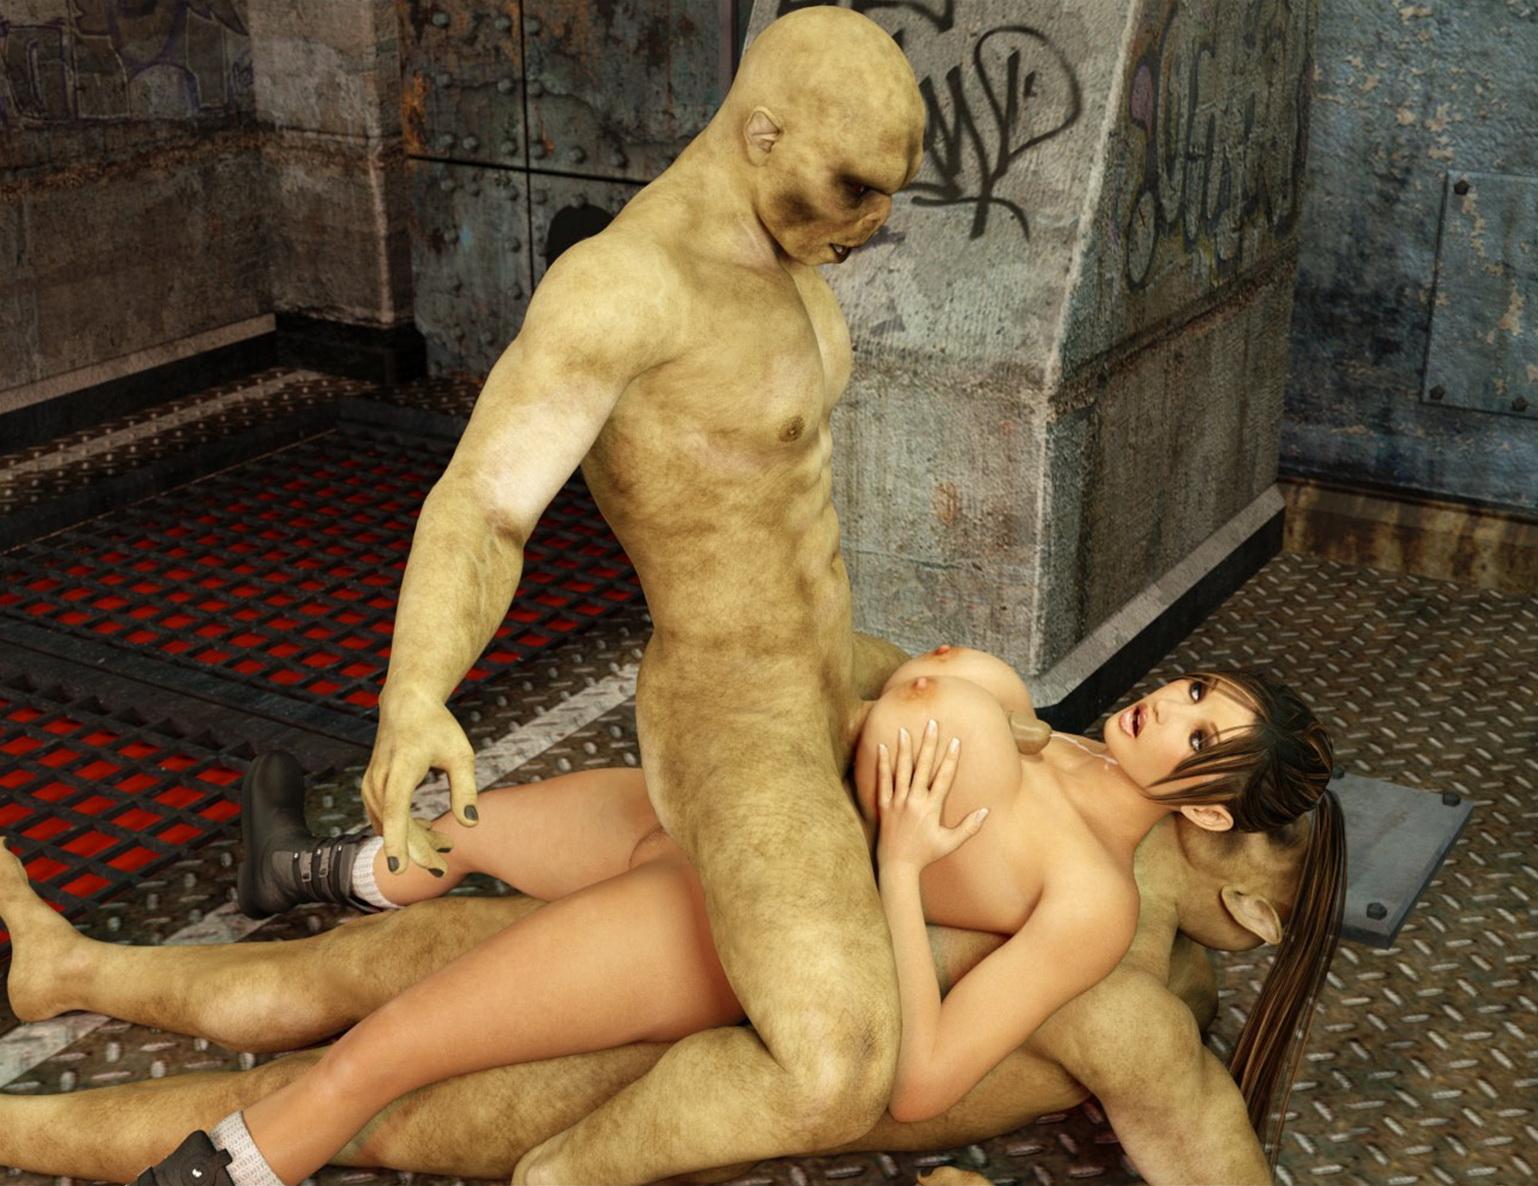 Онлайн порно мультики секс с чудовищами